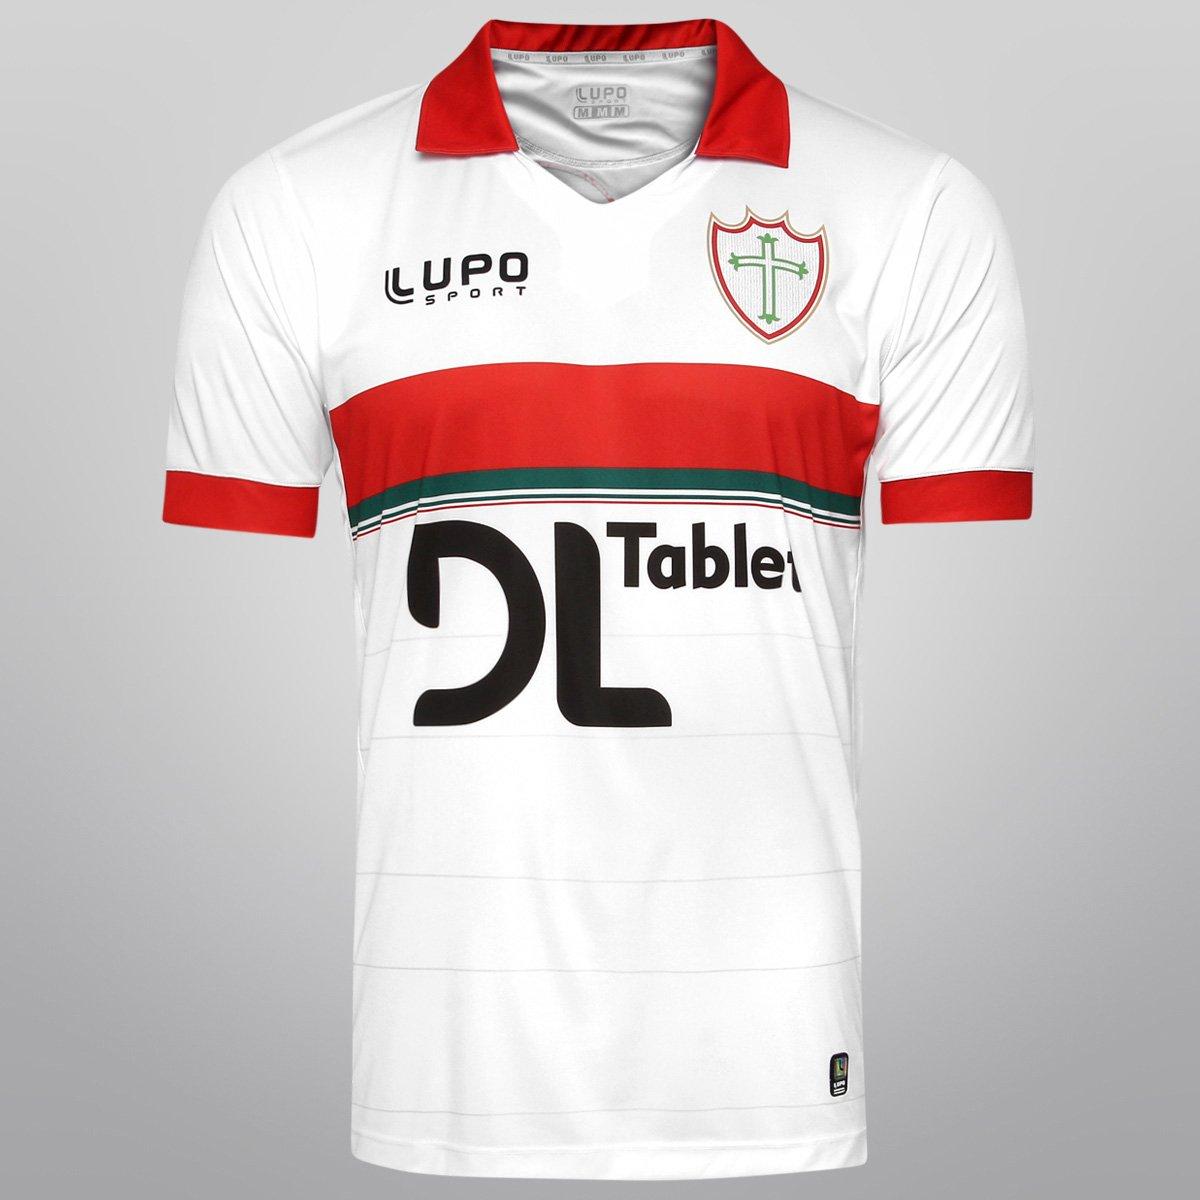 695c7a8ee7b Camisa Lupo Portuguesa II 2014 n° 10 - Compre Agora